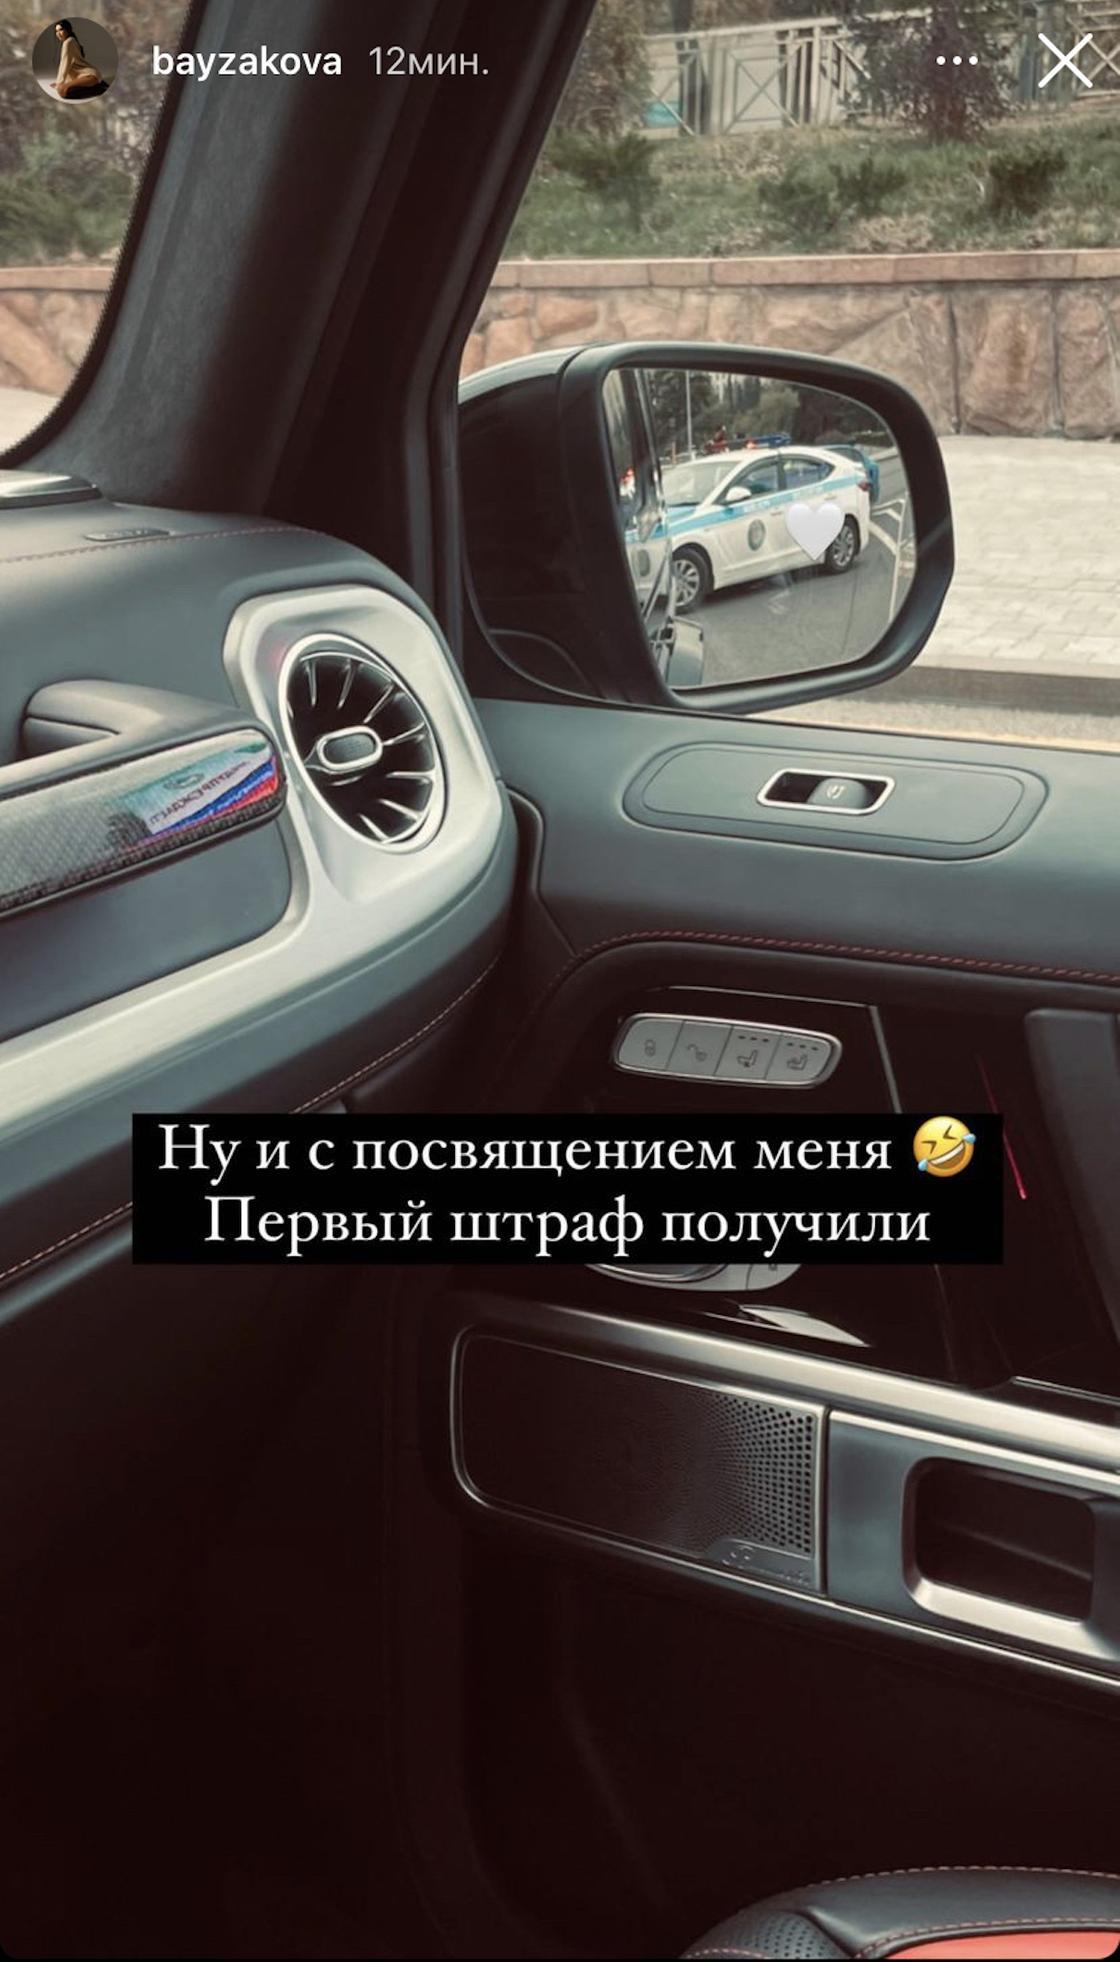 Stories Айжан Байзаковой